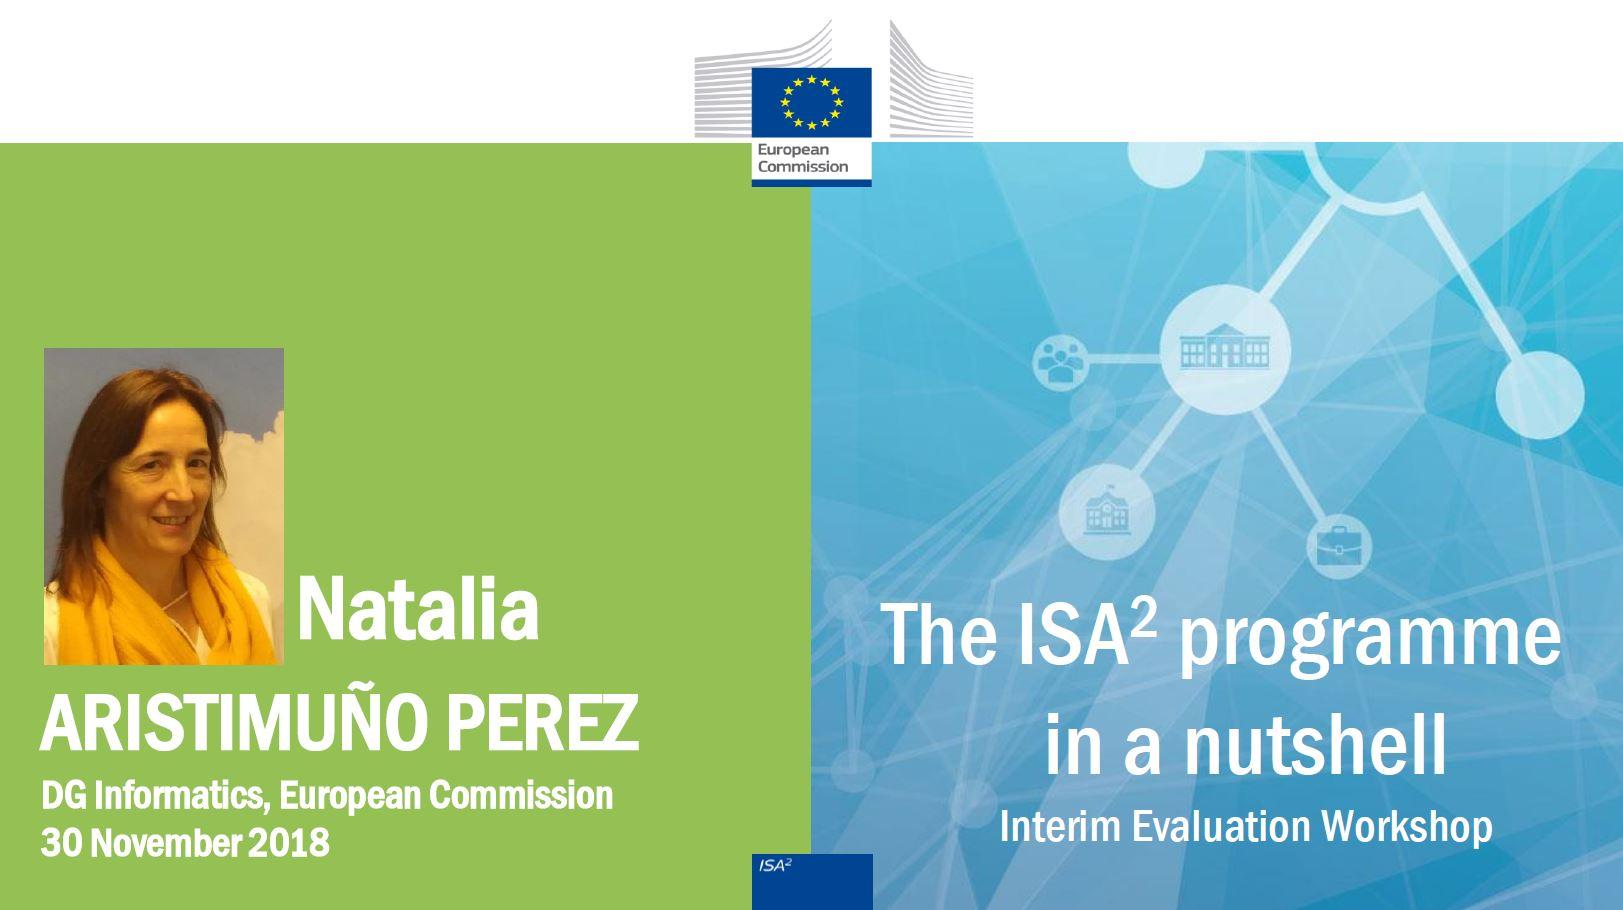 ISA² Interim Evaluation Workshop